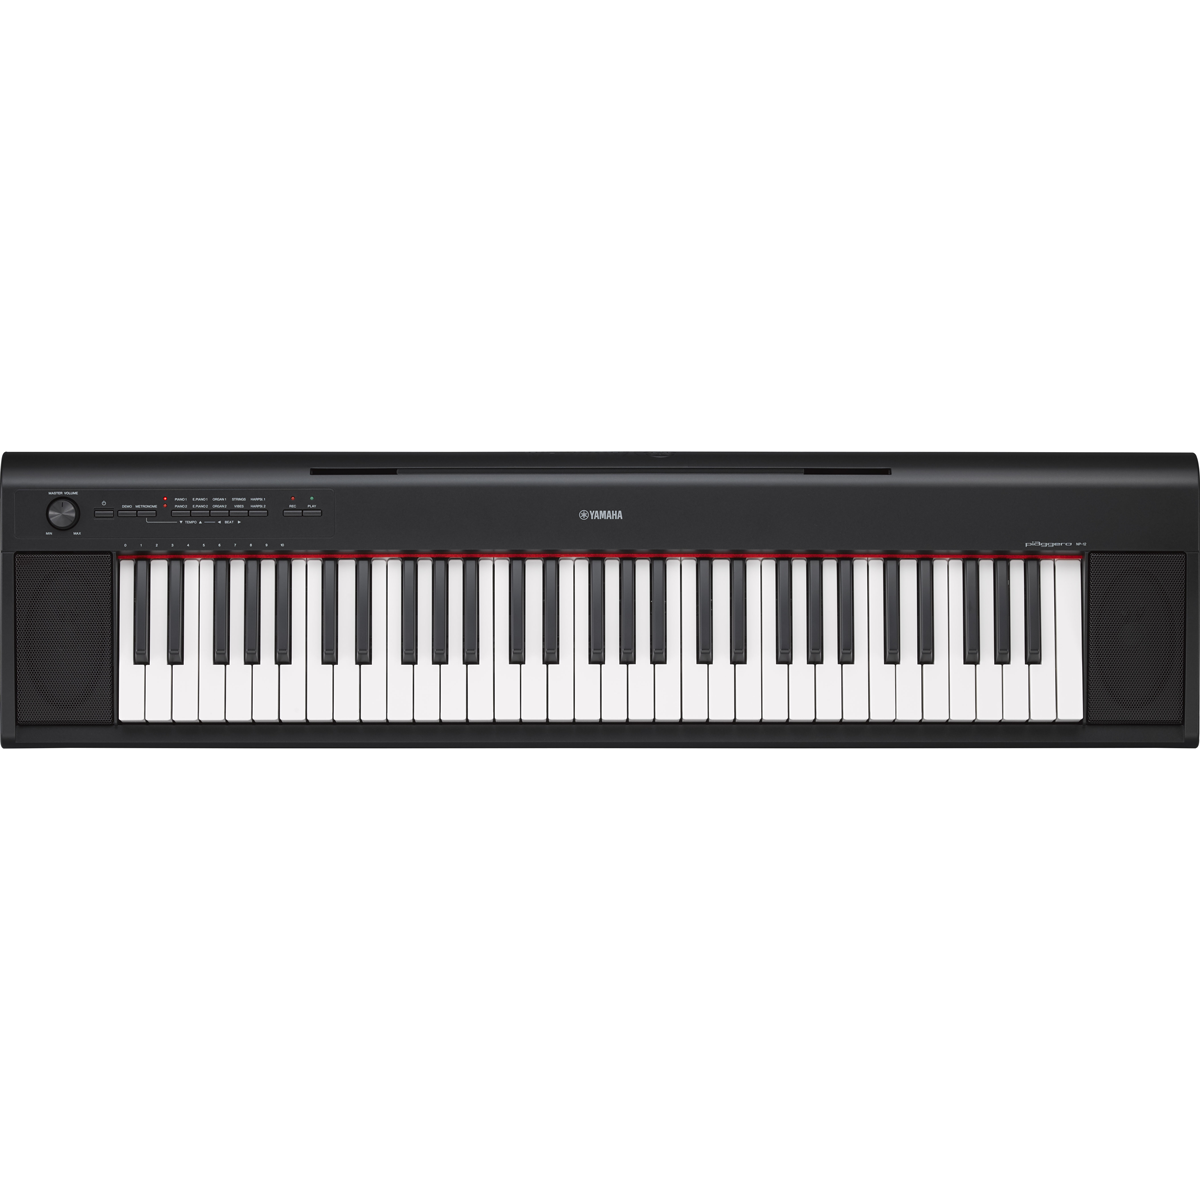 Billede af Yamaha NP-12BPiaggero el-klaver sort